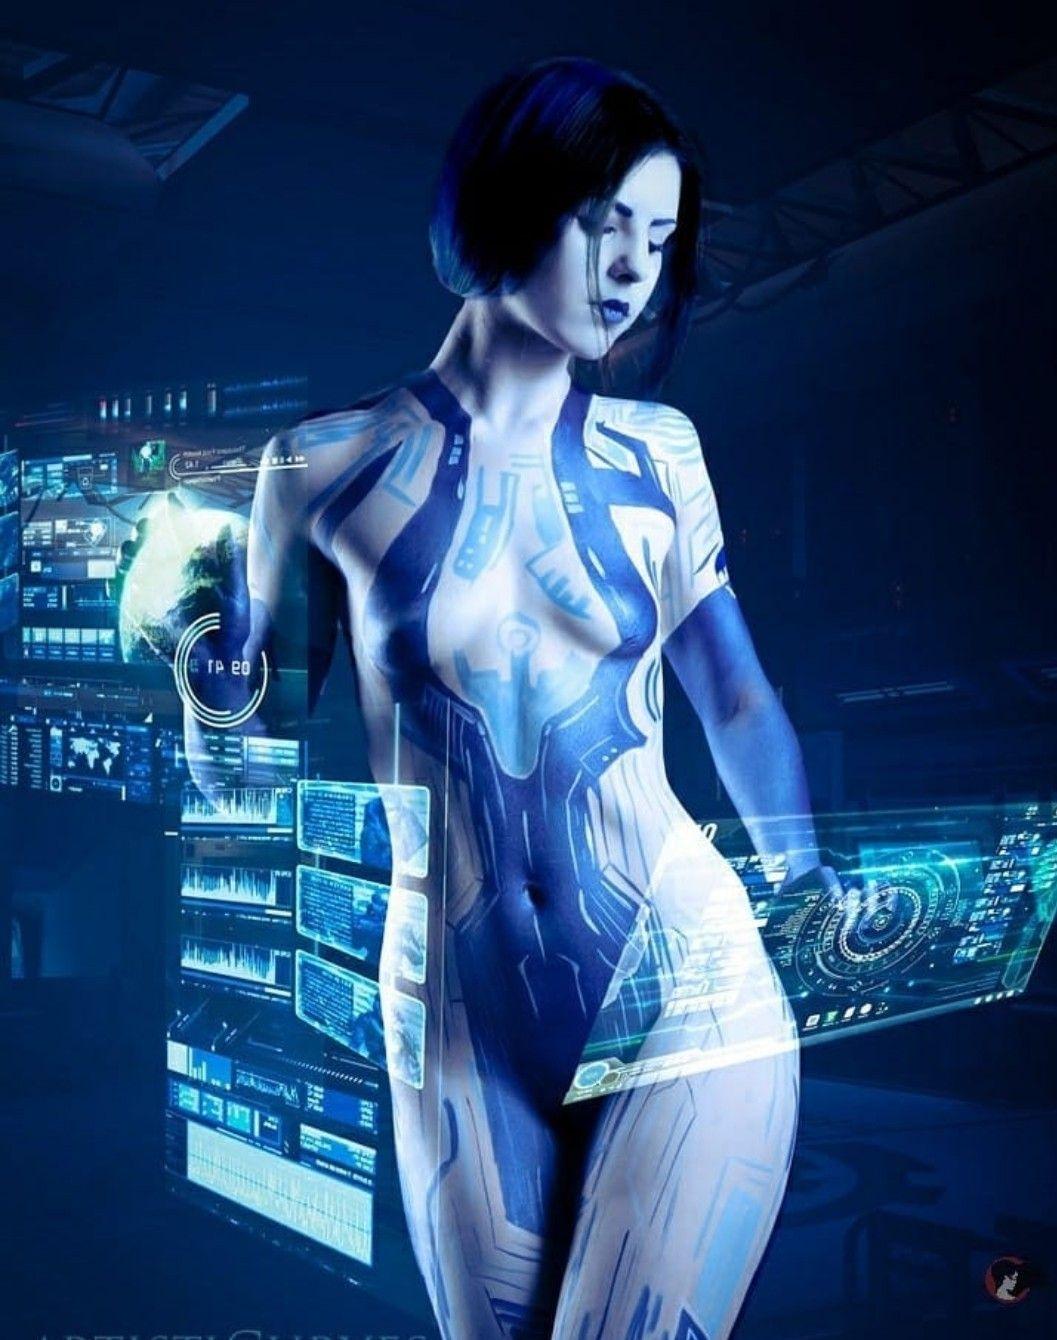 Cortana Portrait by Biseuse on DeviantArt